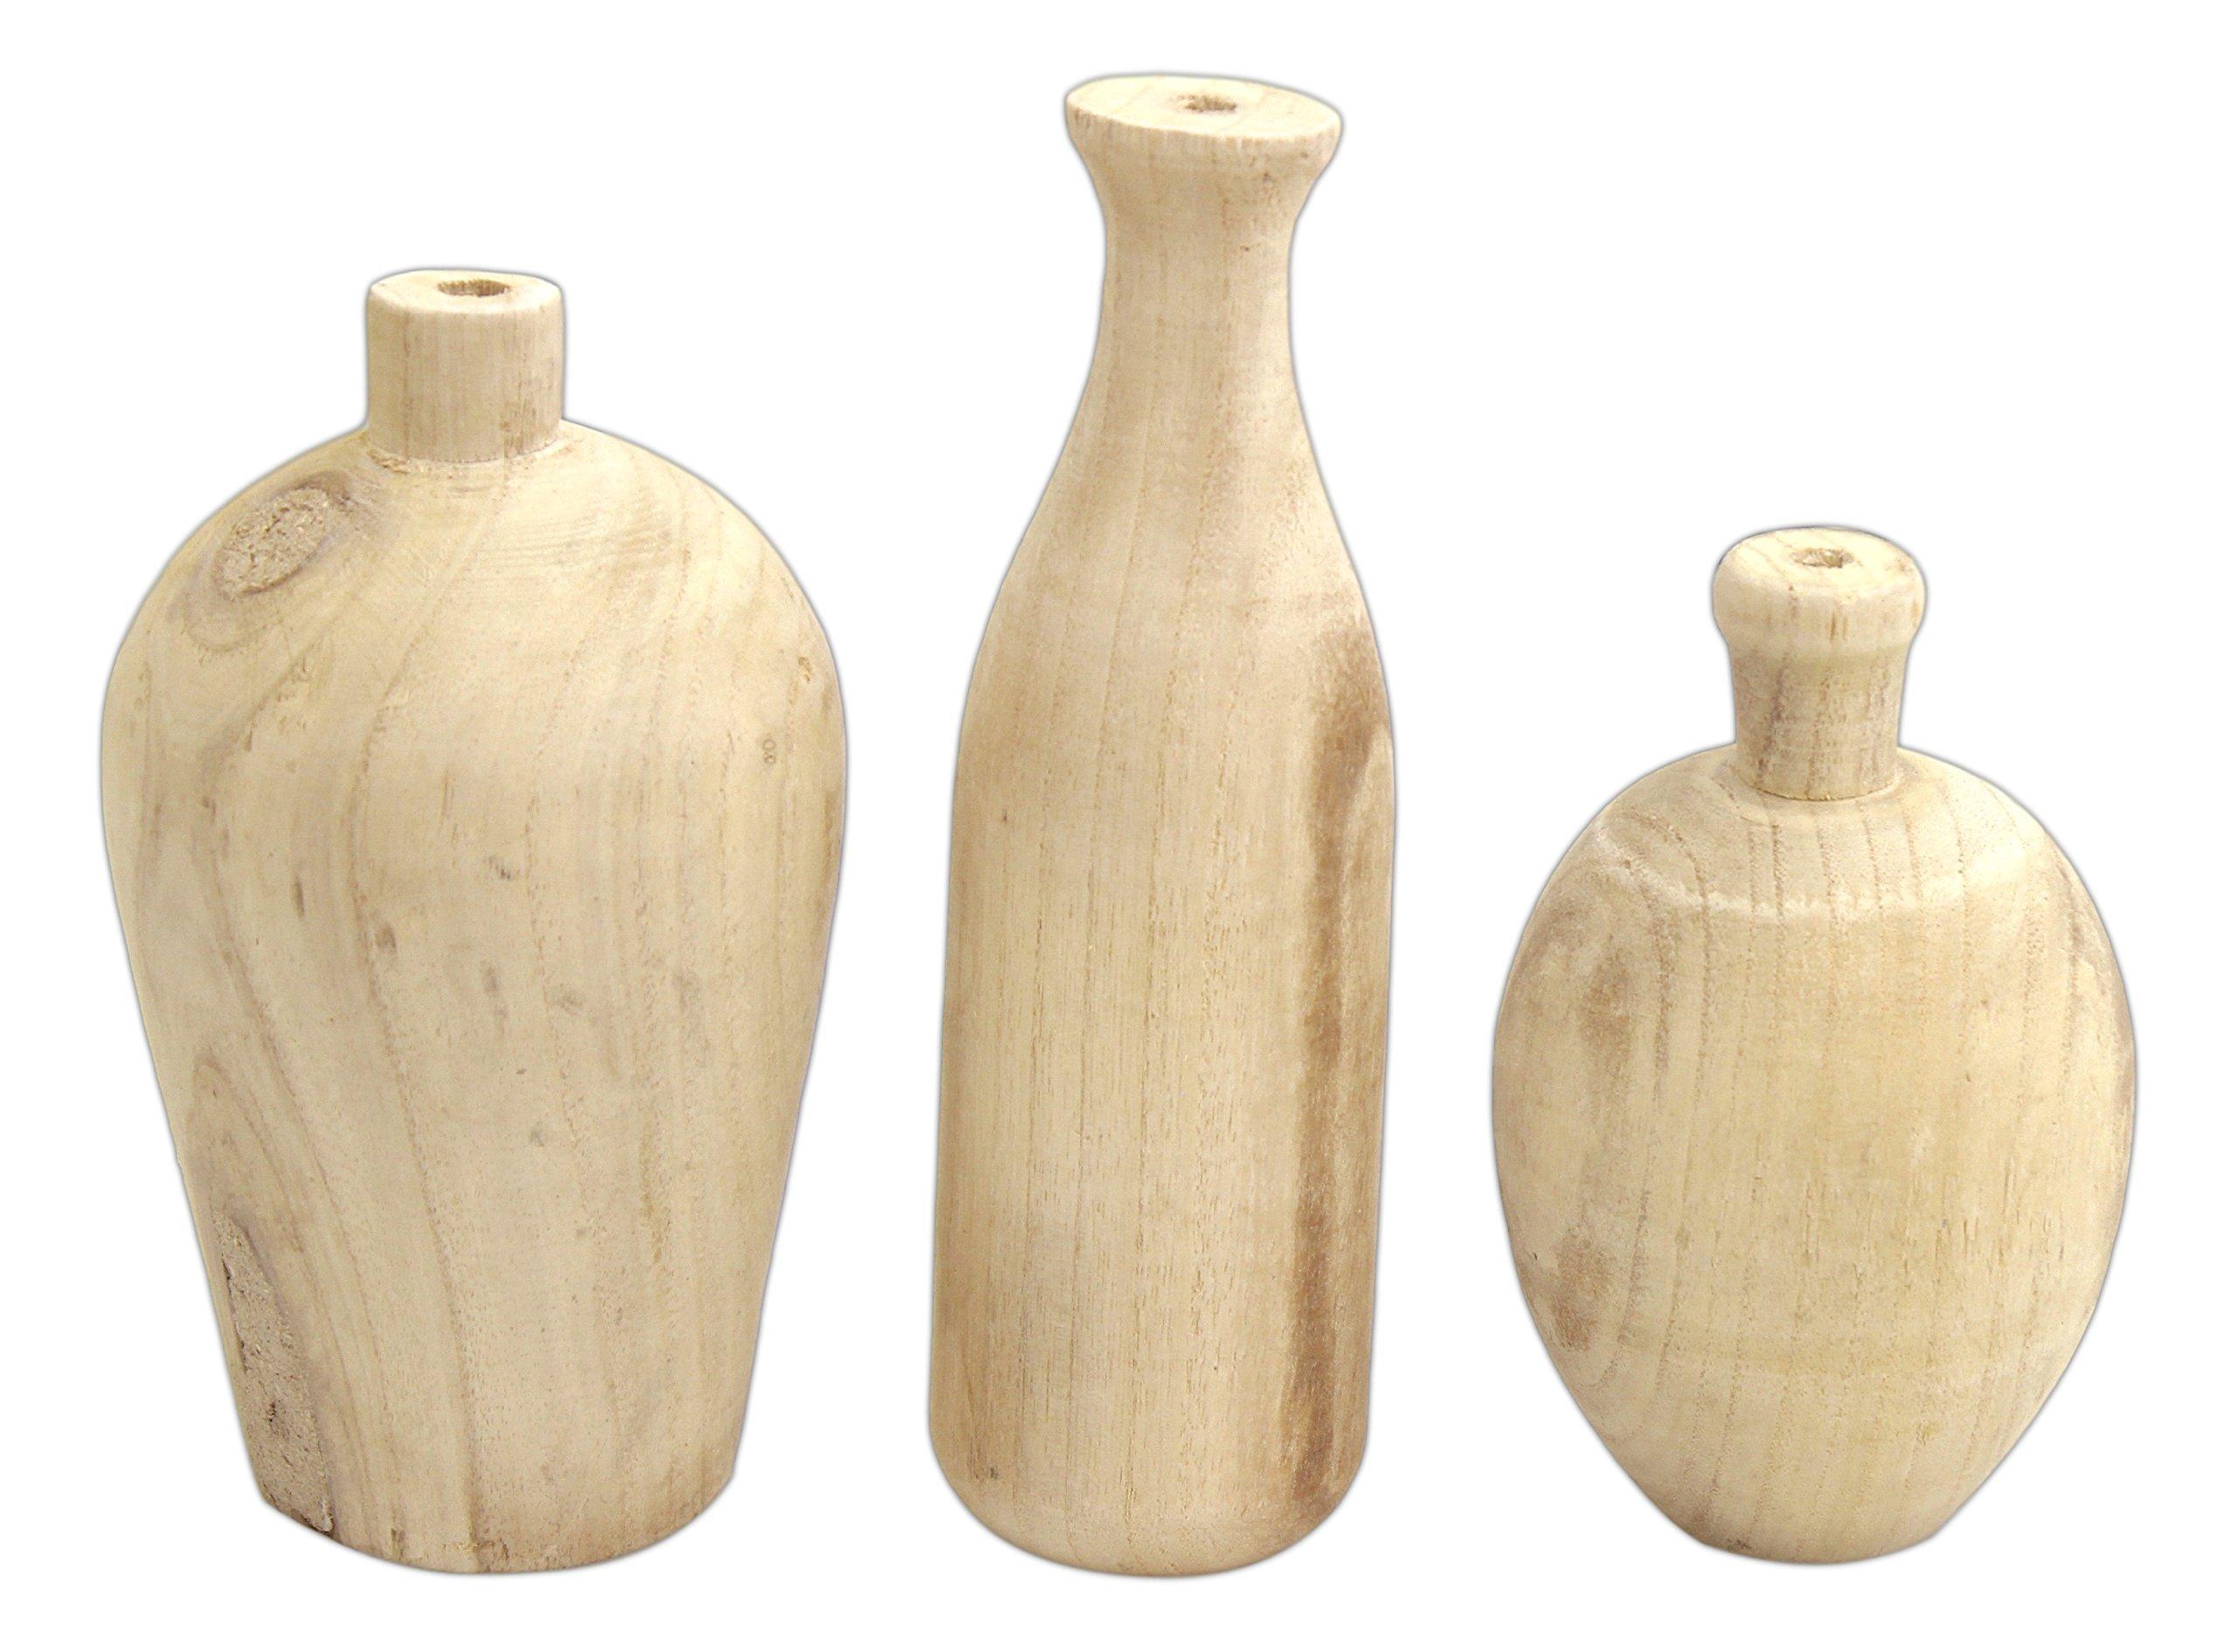 Set of 3 Creative Co-Op Paulownia Wood Vases, Beige, 9.5''H x 4.5''W